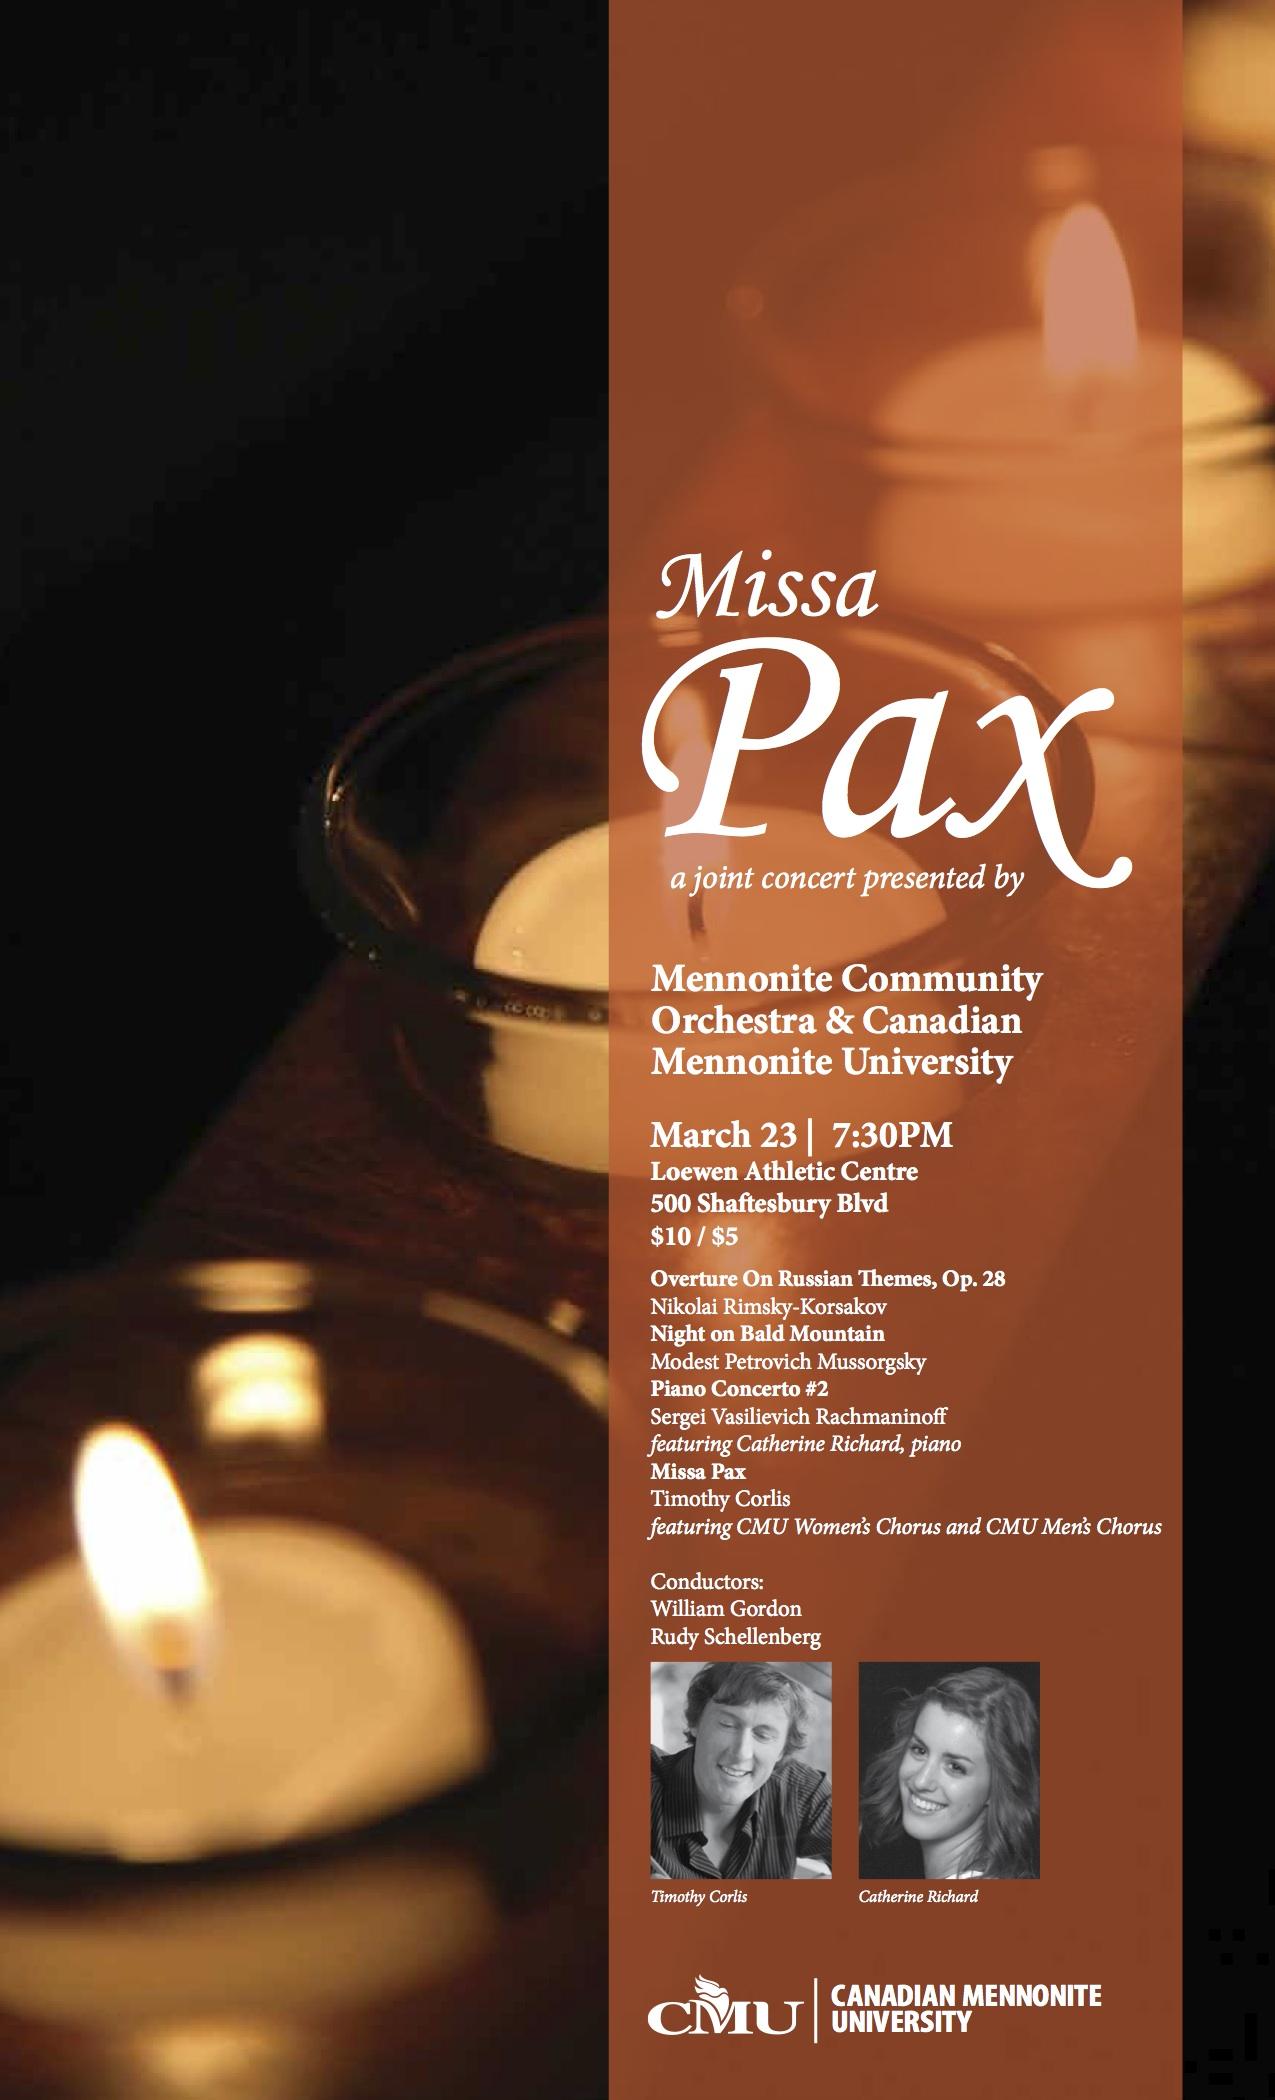 CMU_Missa_Pax